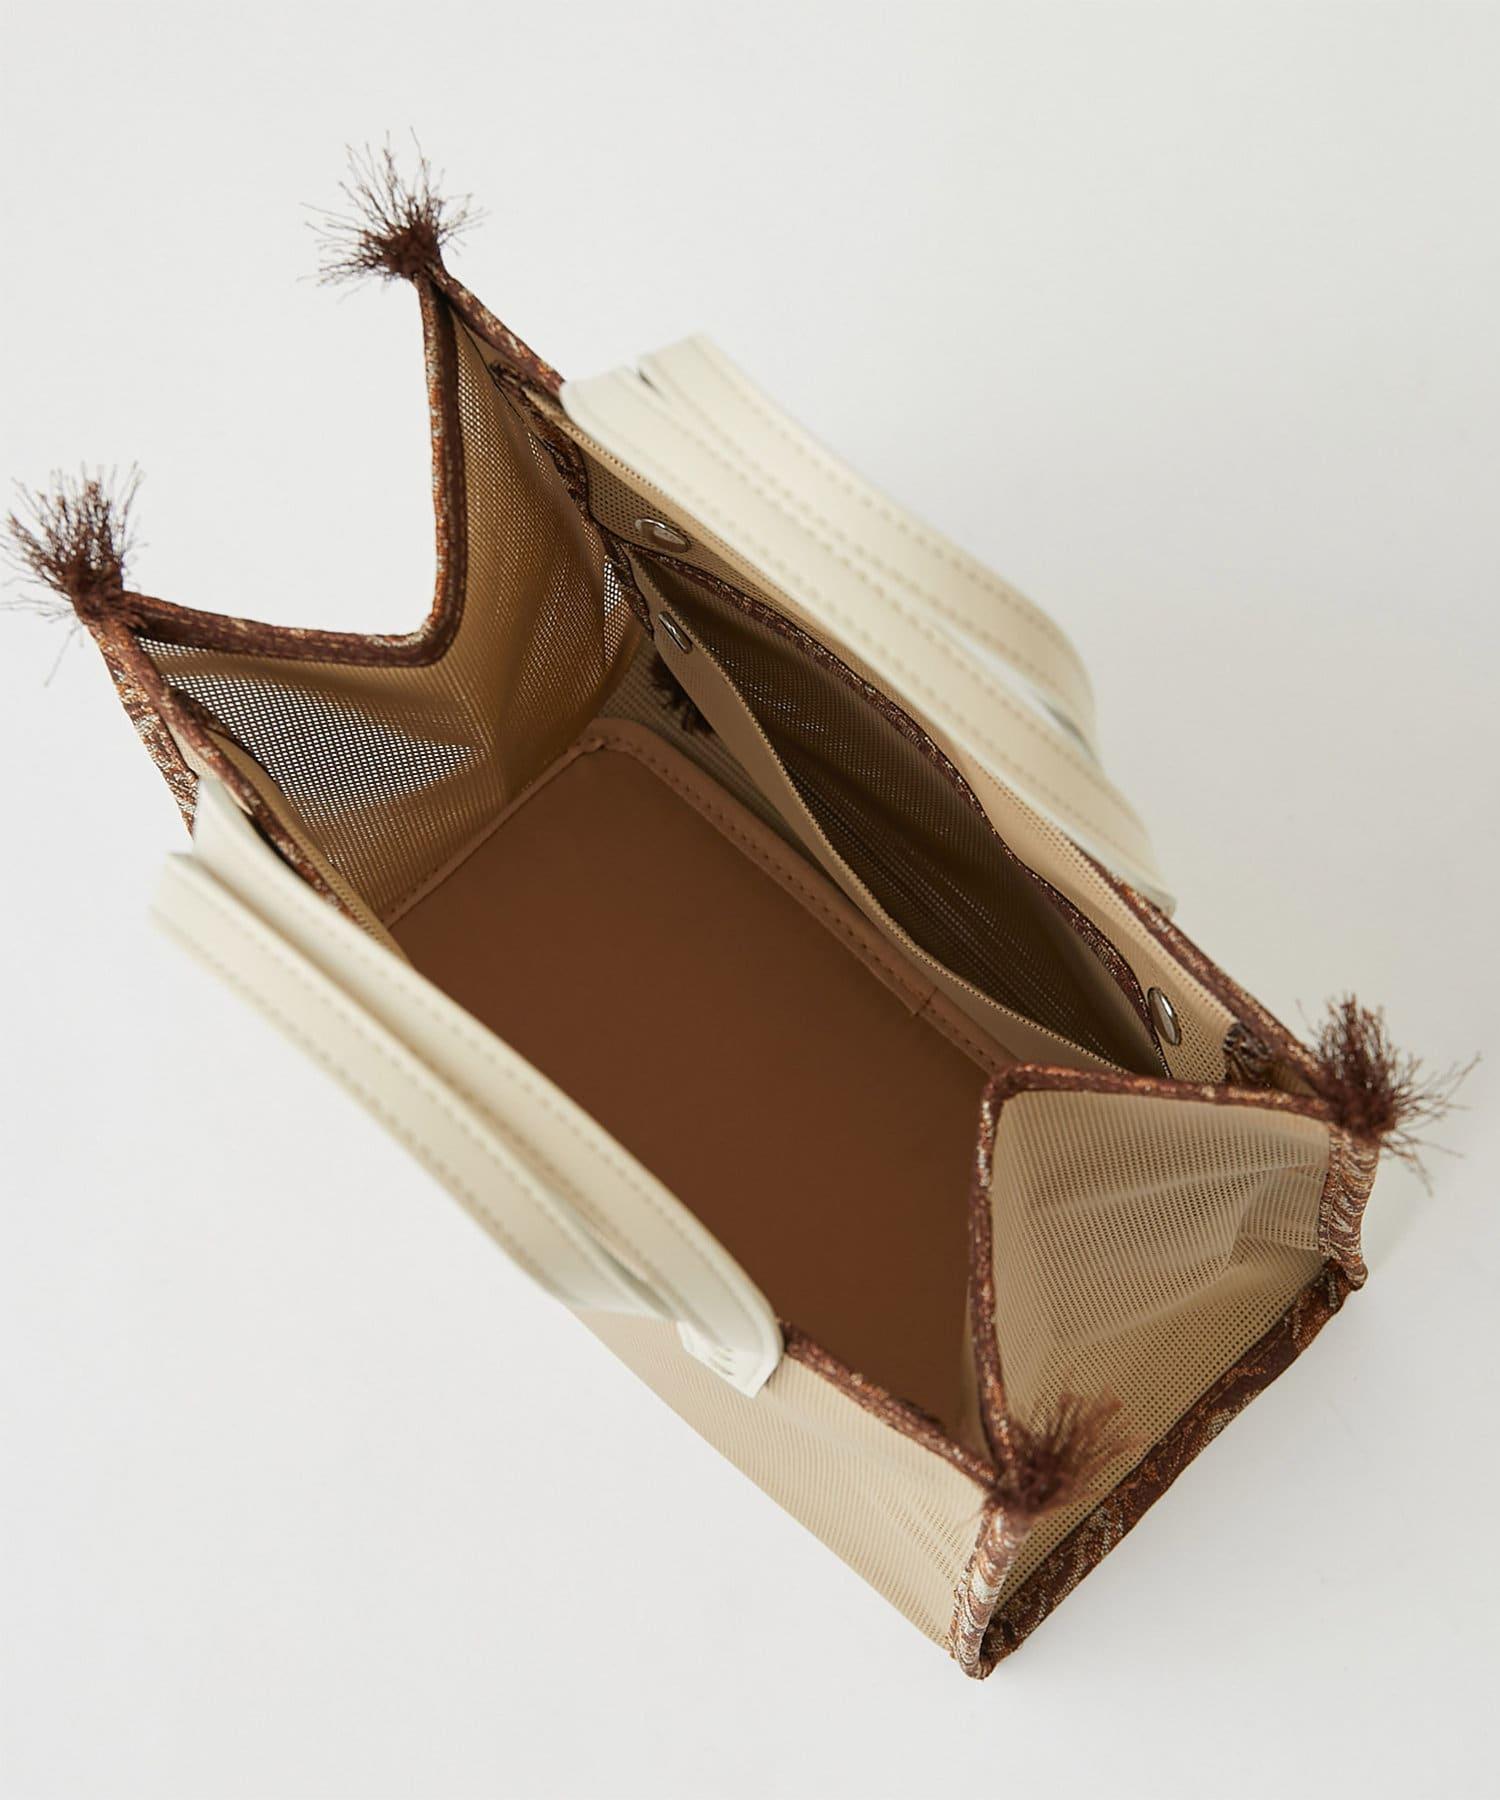 GALLARDAGALANTE(ガリャルダガランテ) 【A VACATION】メッシュミニトートバッグ/BOX <別注カラー>